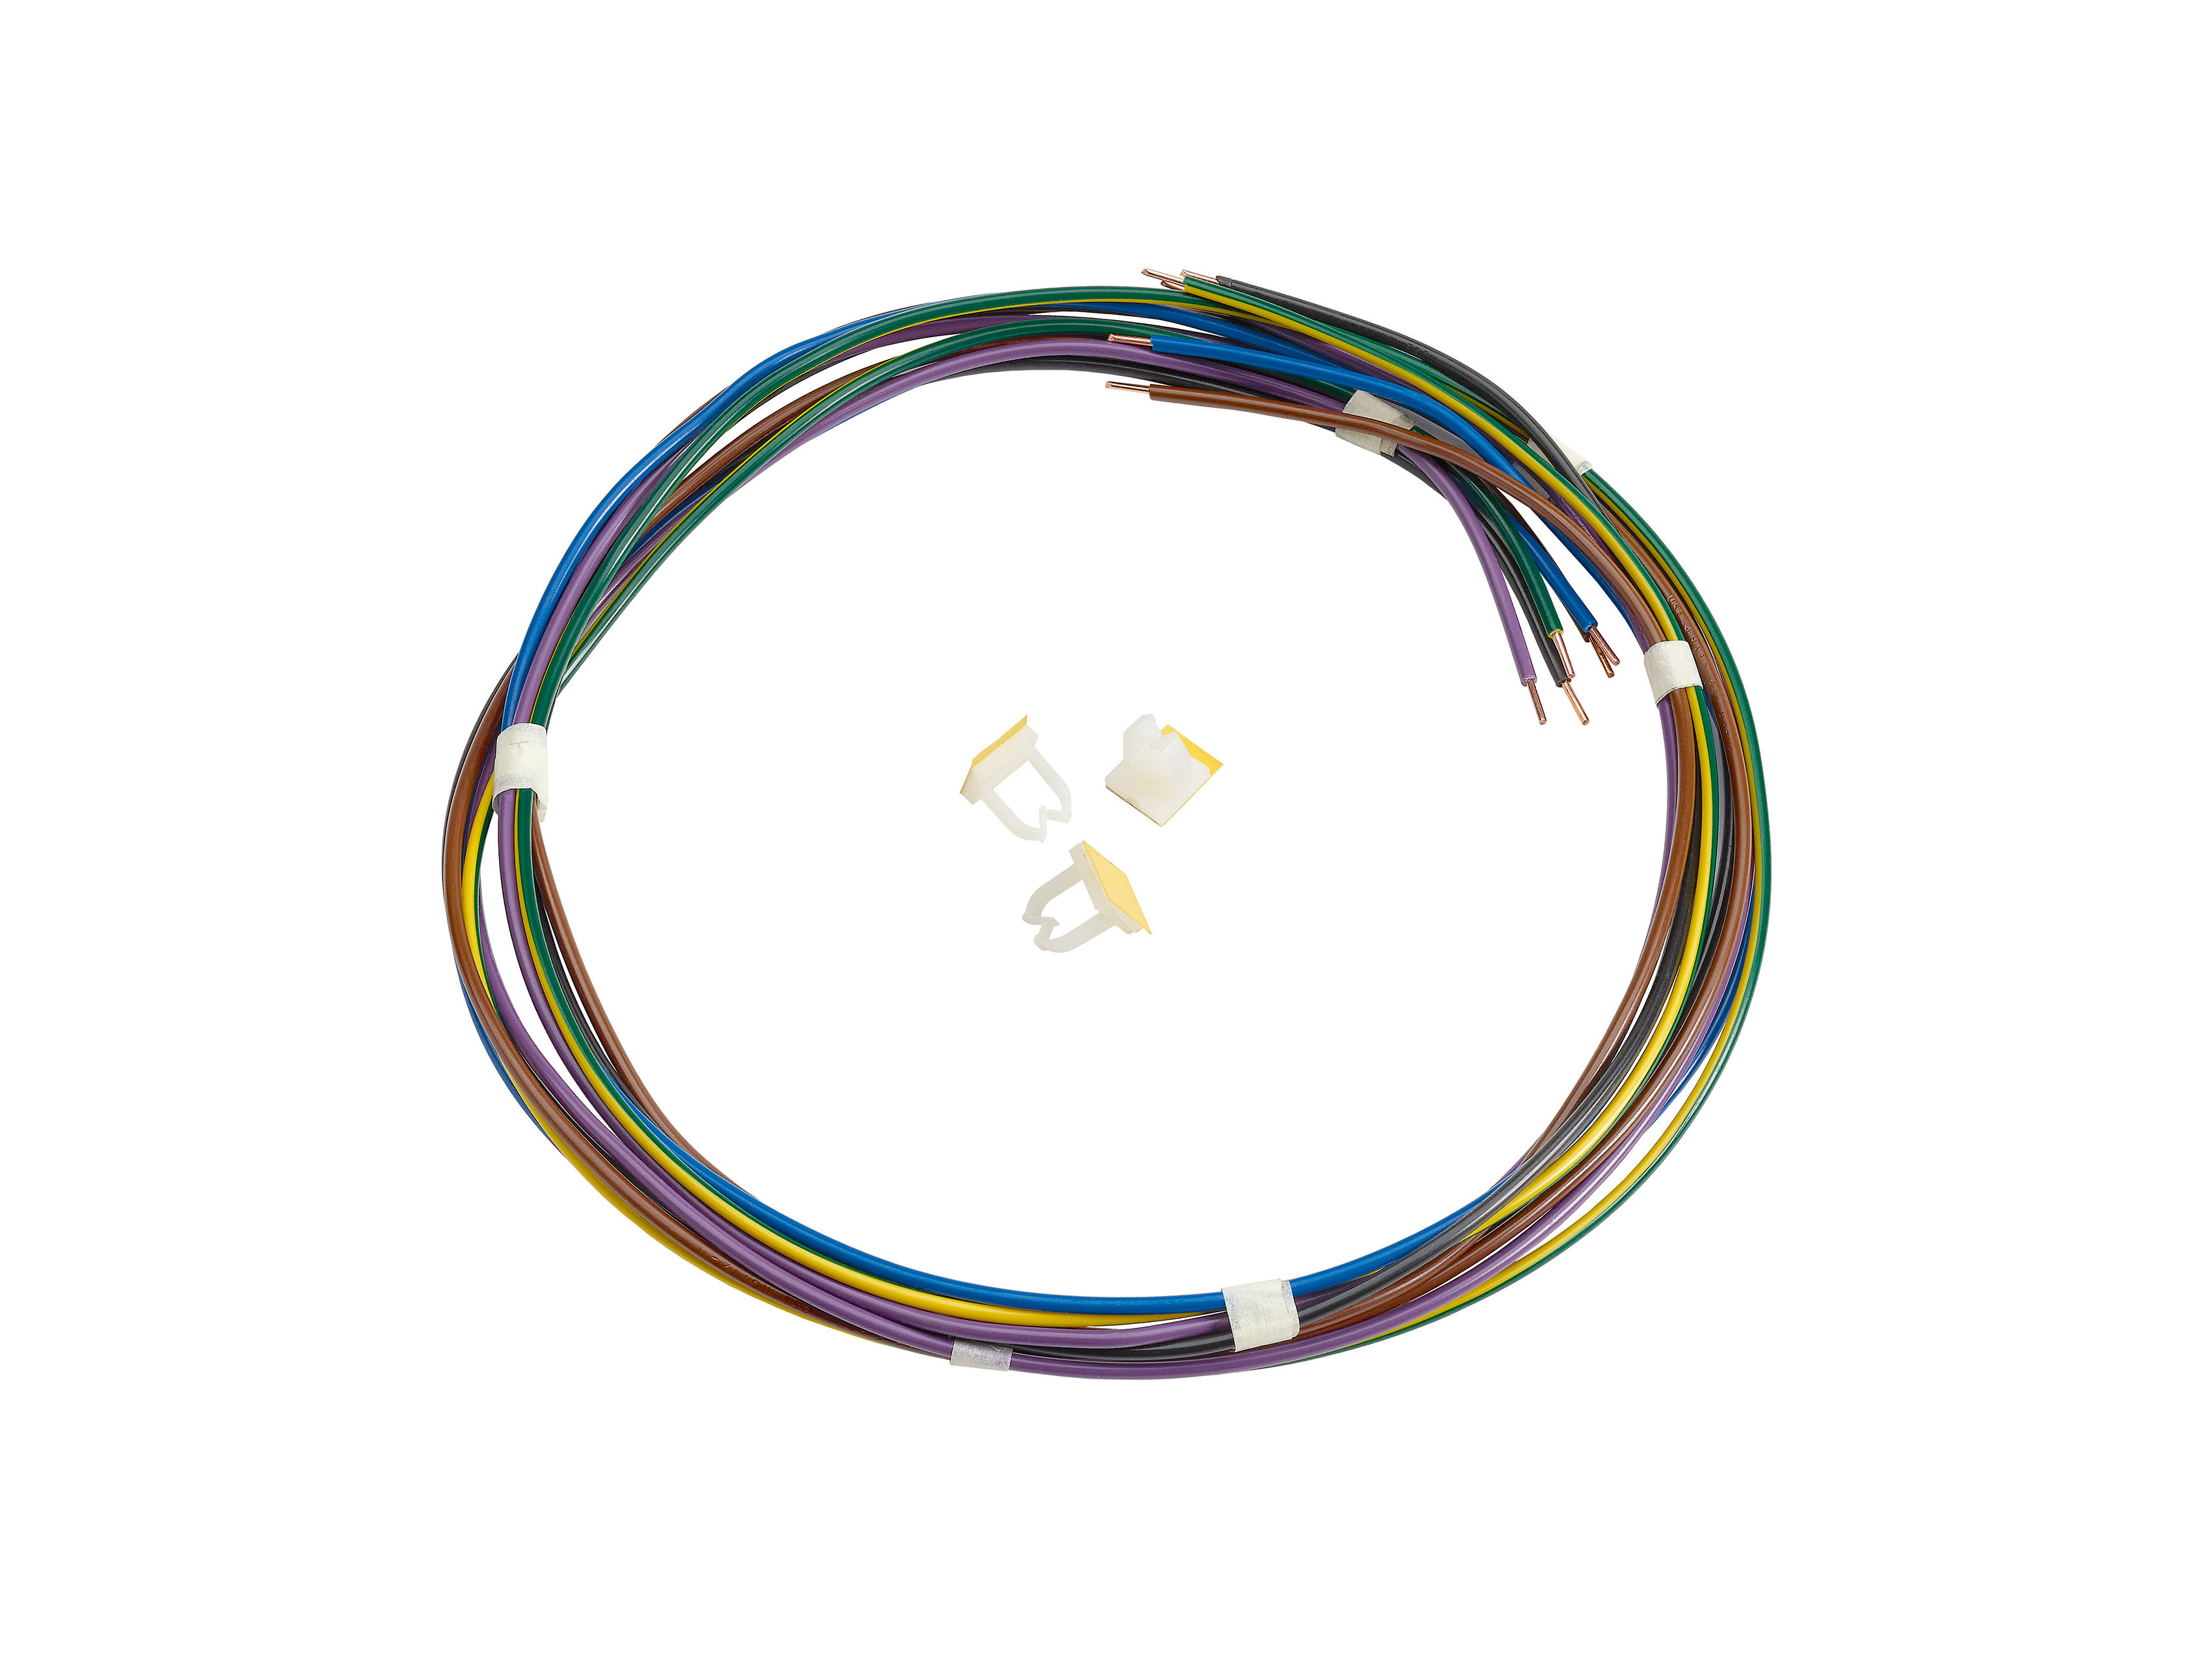 Sylvania Rana Linear LED Durchgangsverdrahtung 5x1,5mm² 1350mm ...